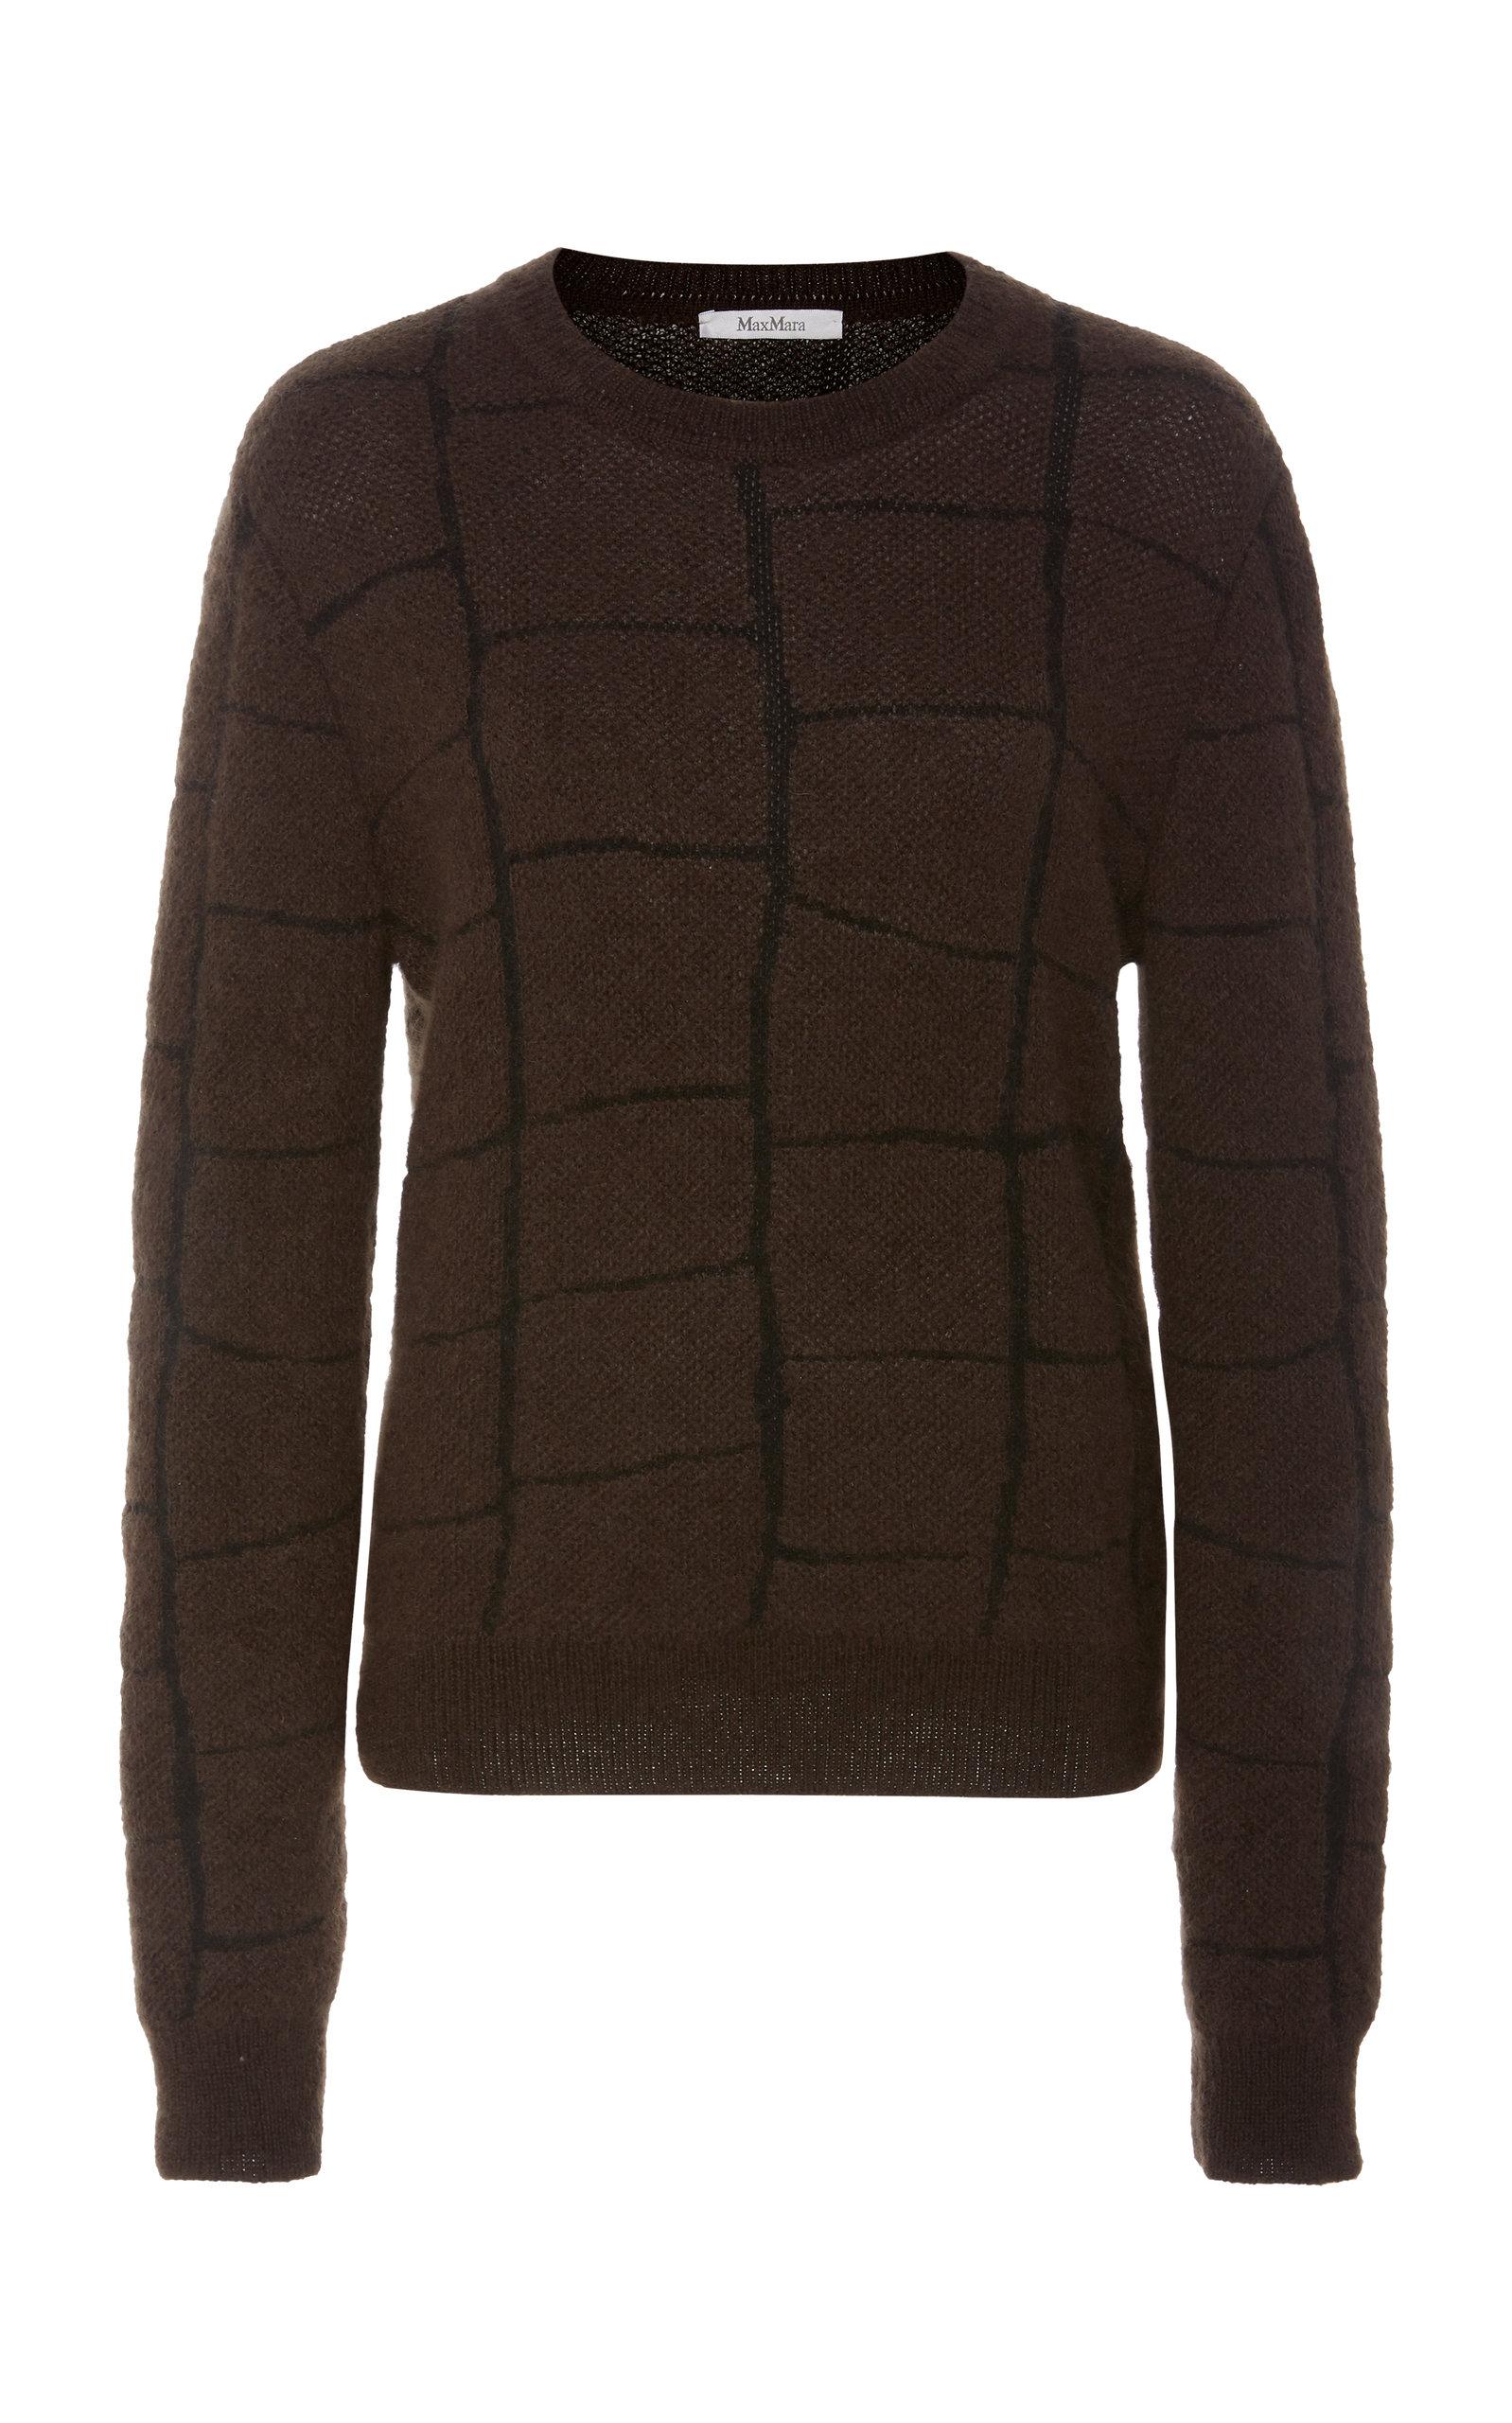 Max Mara Knits Magenta Intarsia-Knit Sweater